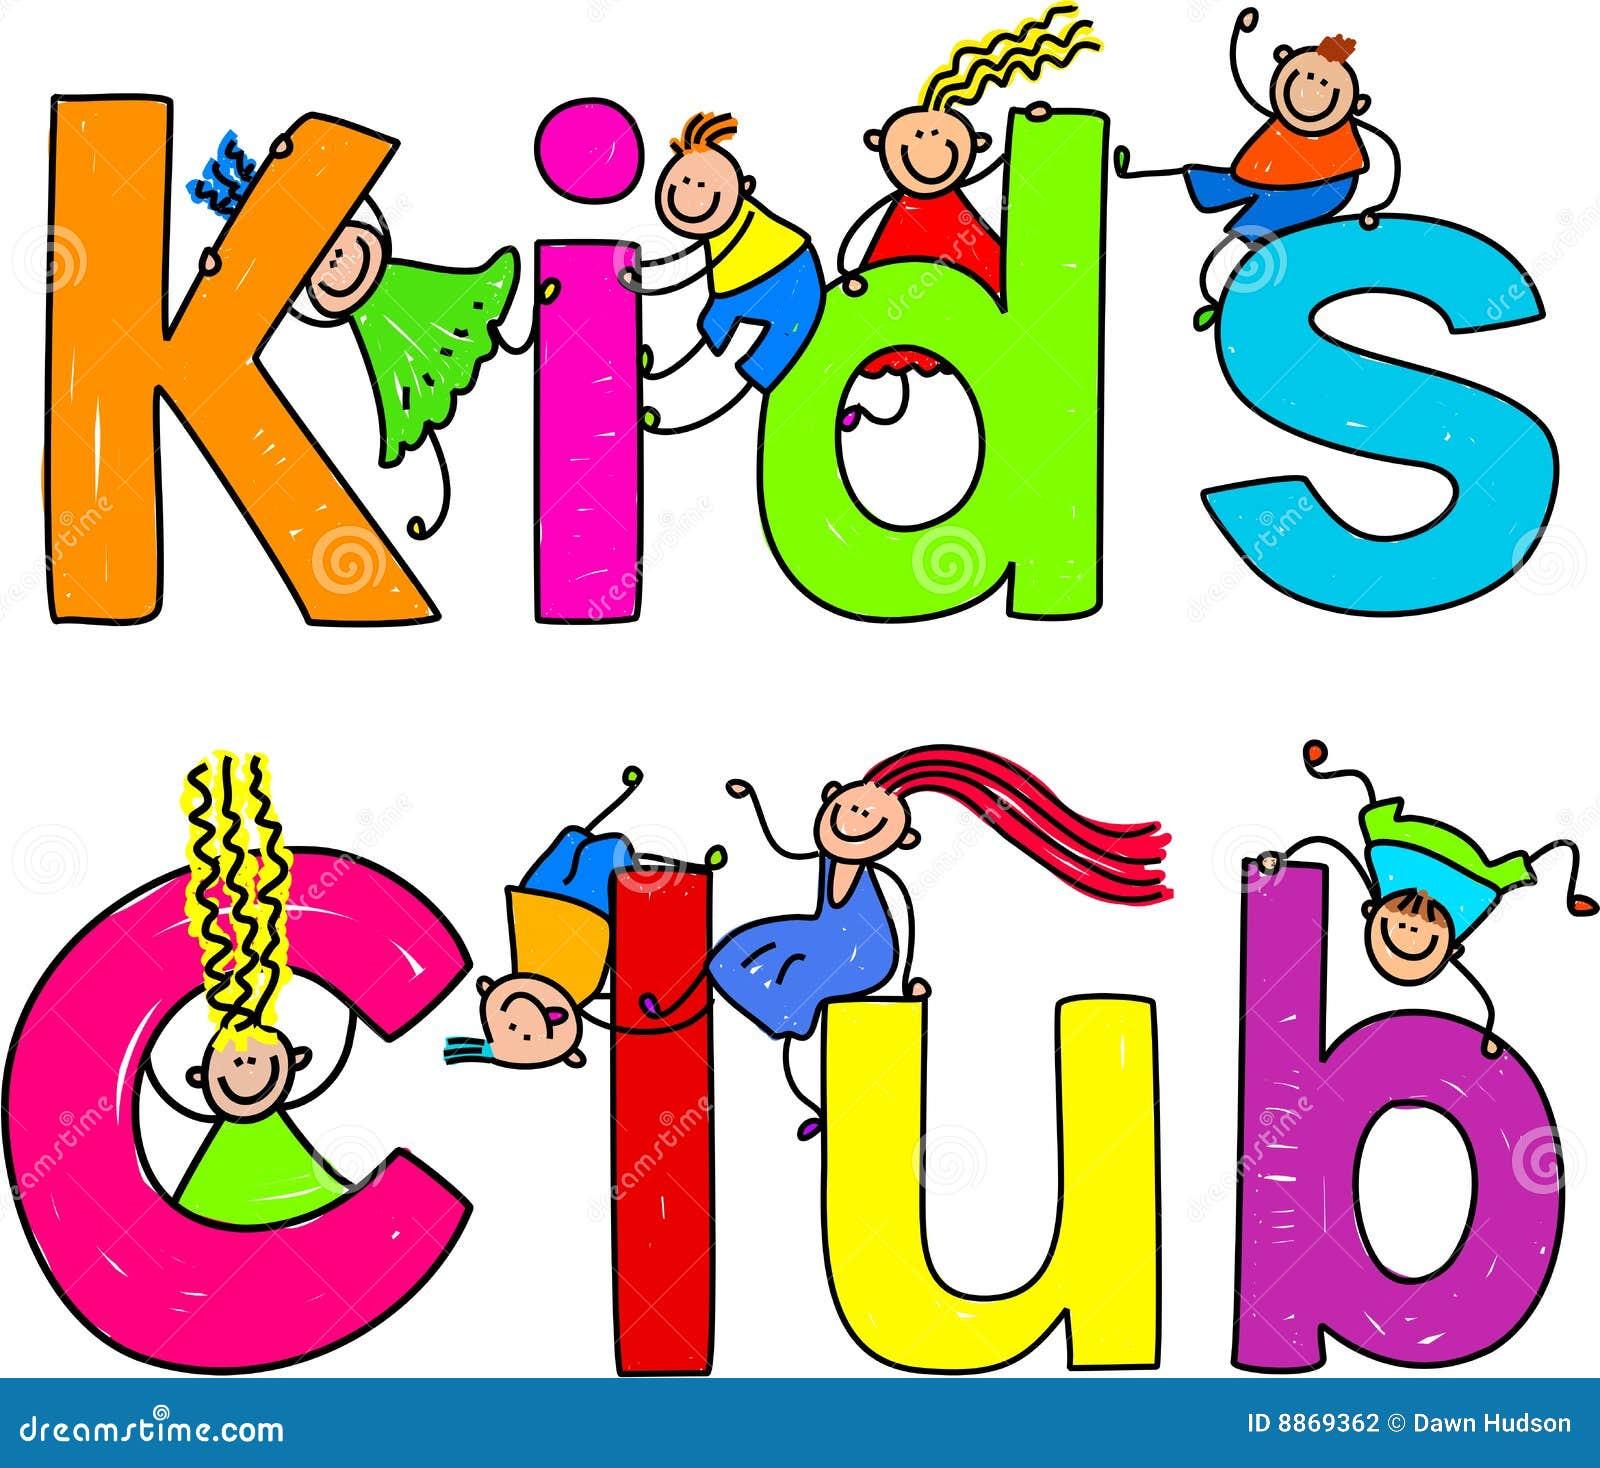 Cute children climbing over the words KIDS CLUB.